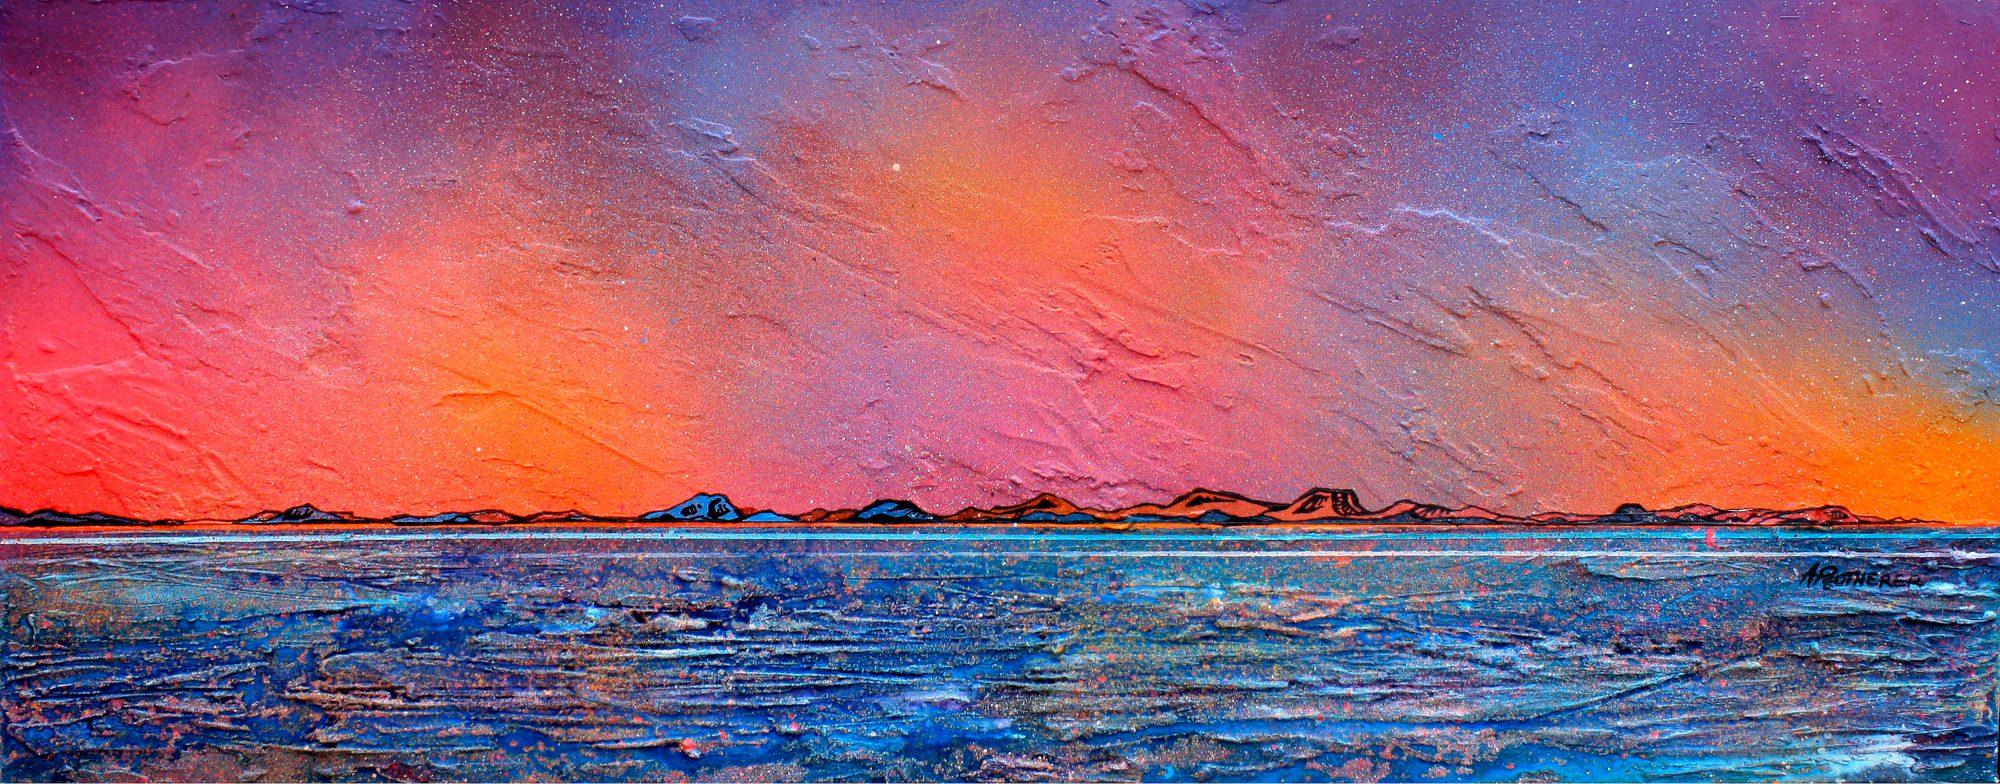 Isle Of Harris Haze, Outer Hebrides, Scotland - original Painting Canvas & Art Prints